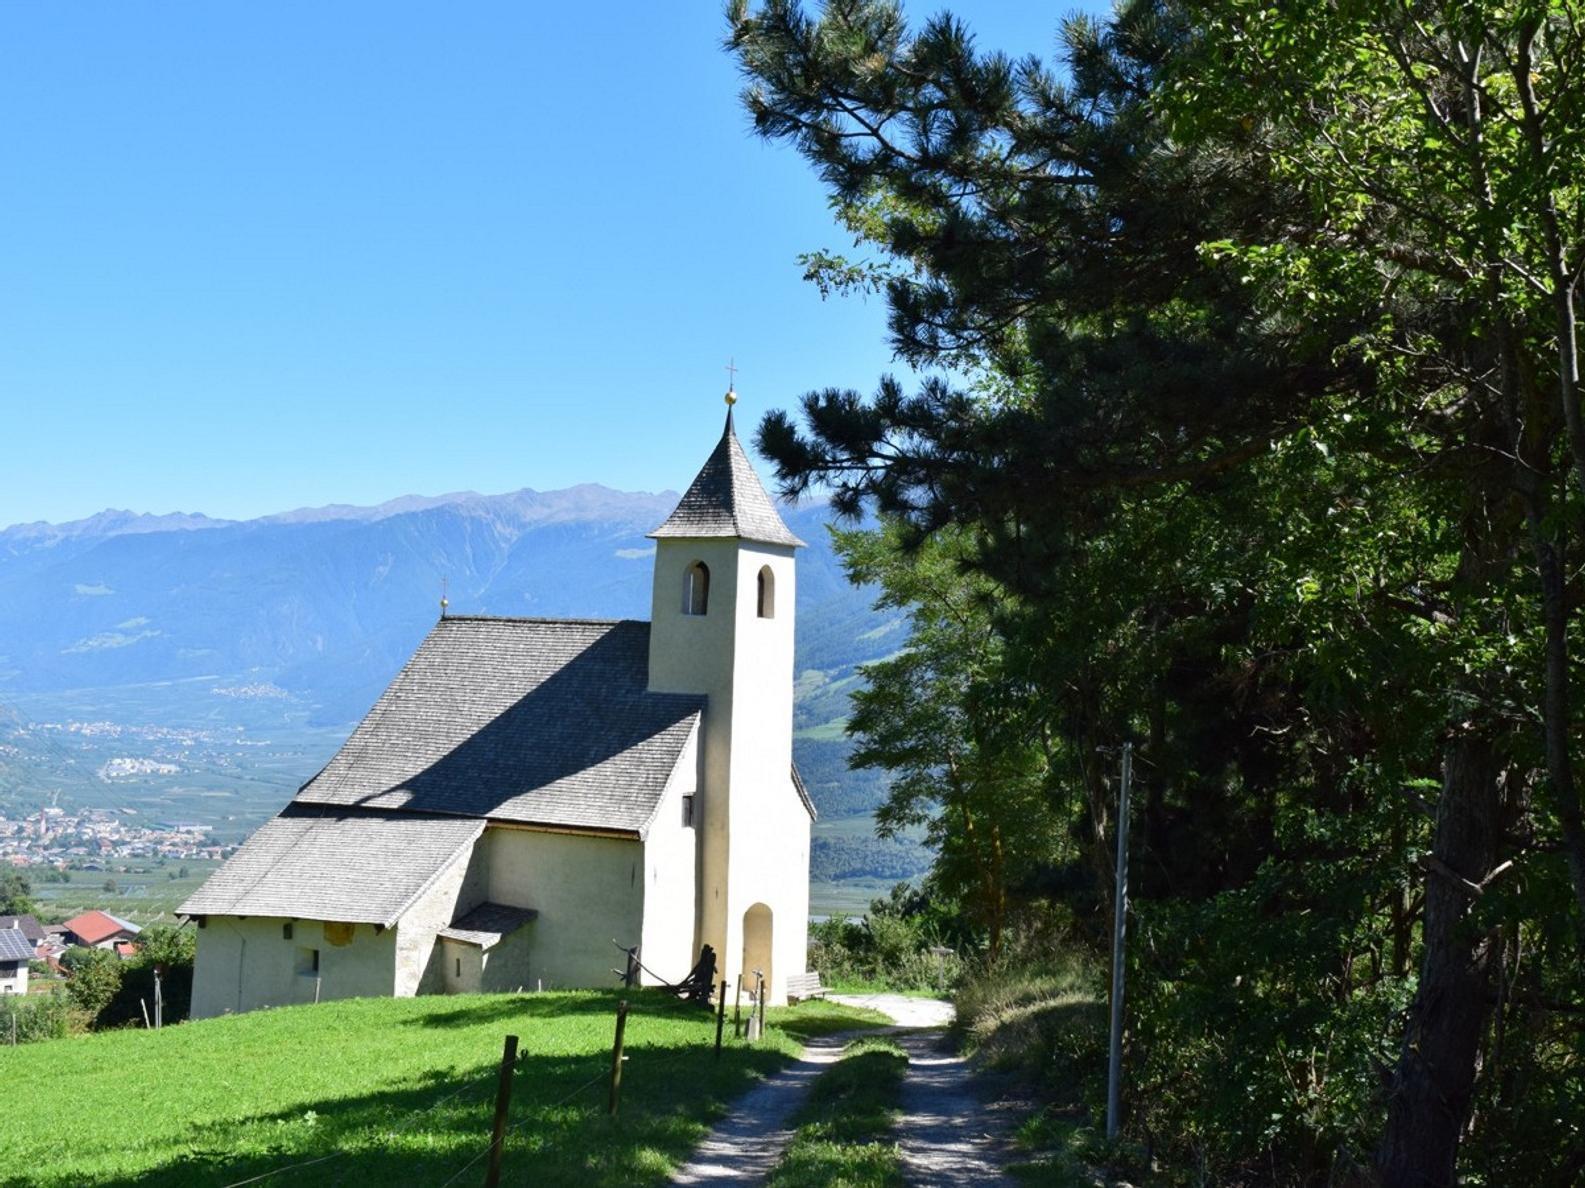 Church of Visitation, Alliz/Allitz